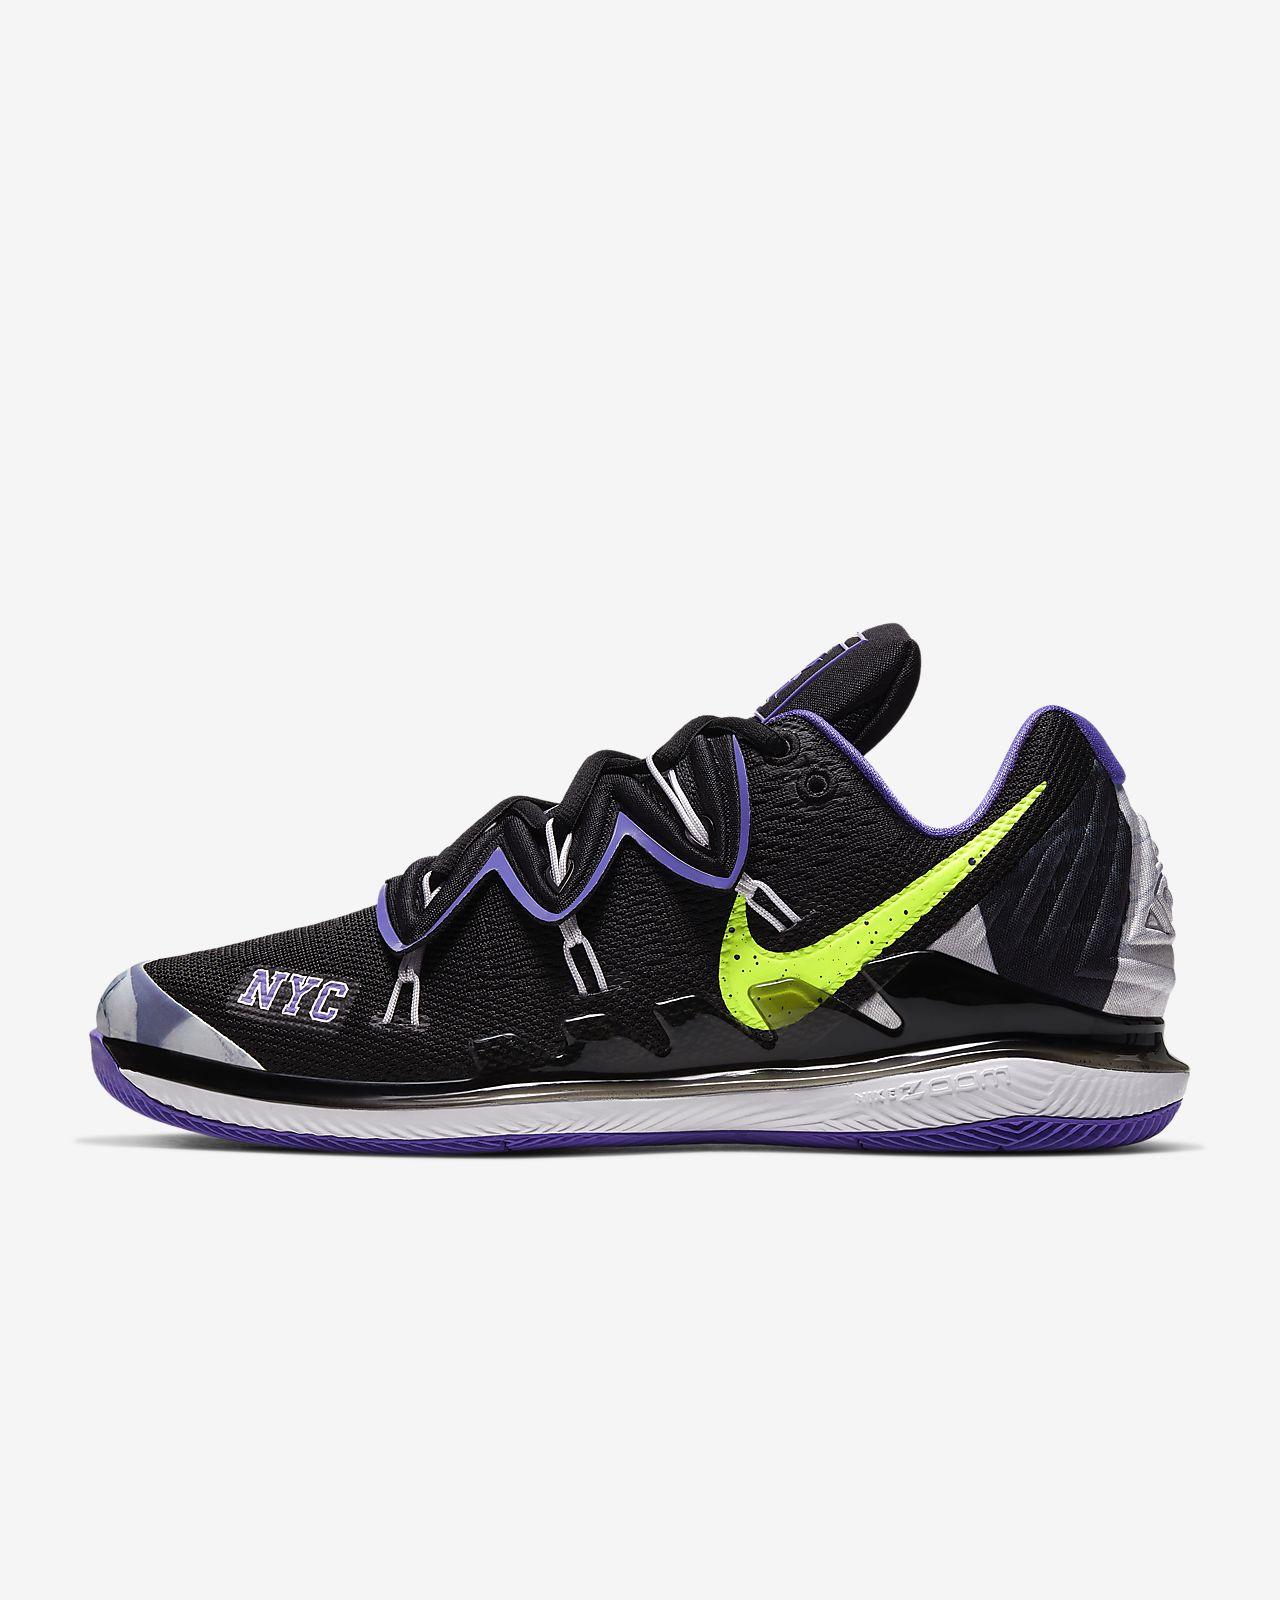 NikeCourt Air Zoom Vapor X Kyrie 5-hardcourt-tennissko til mænd